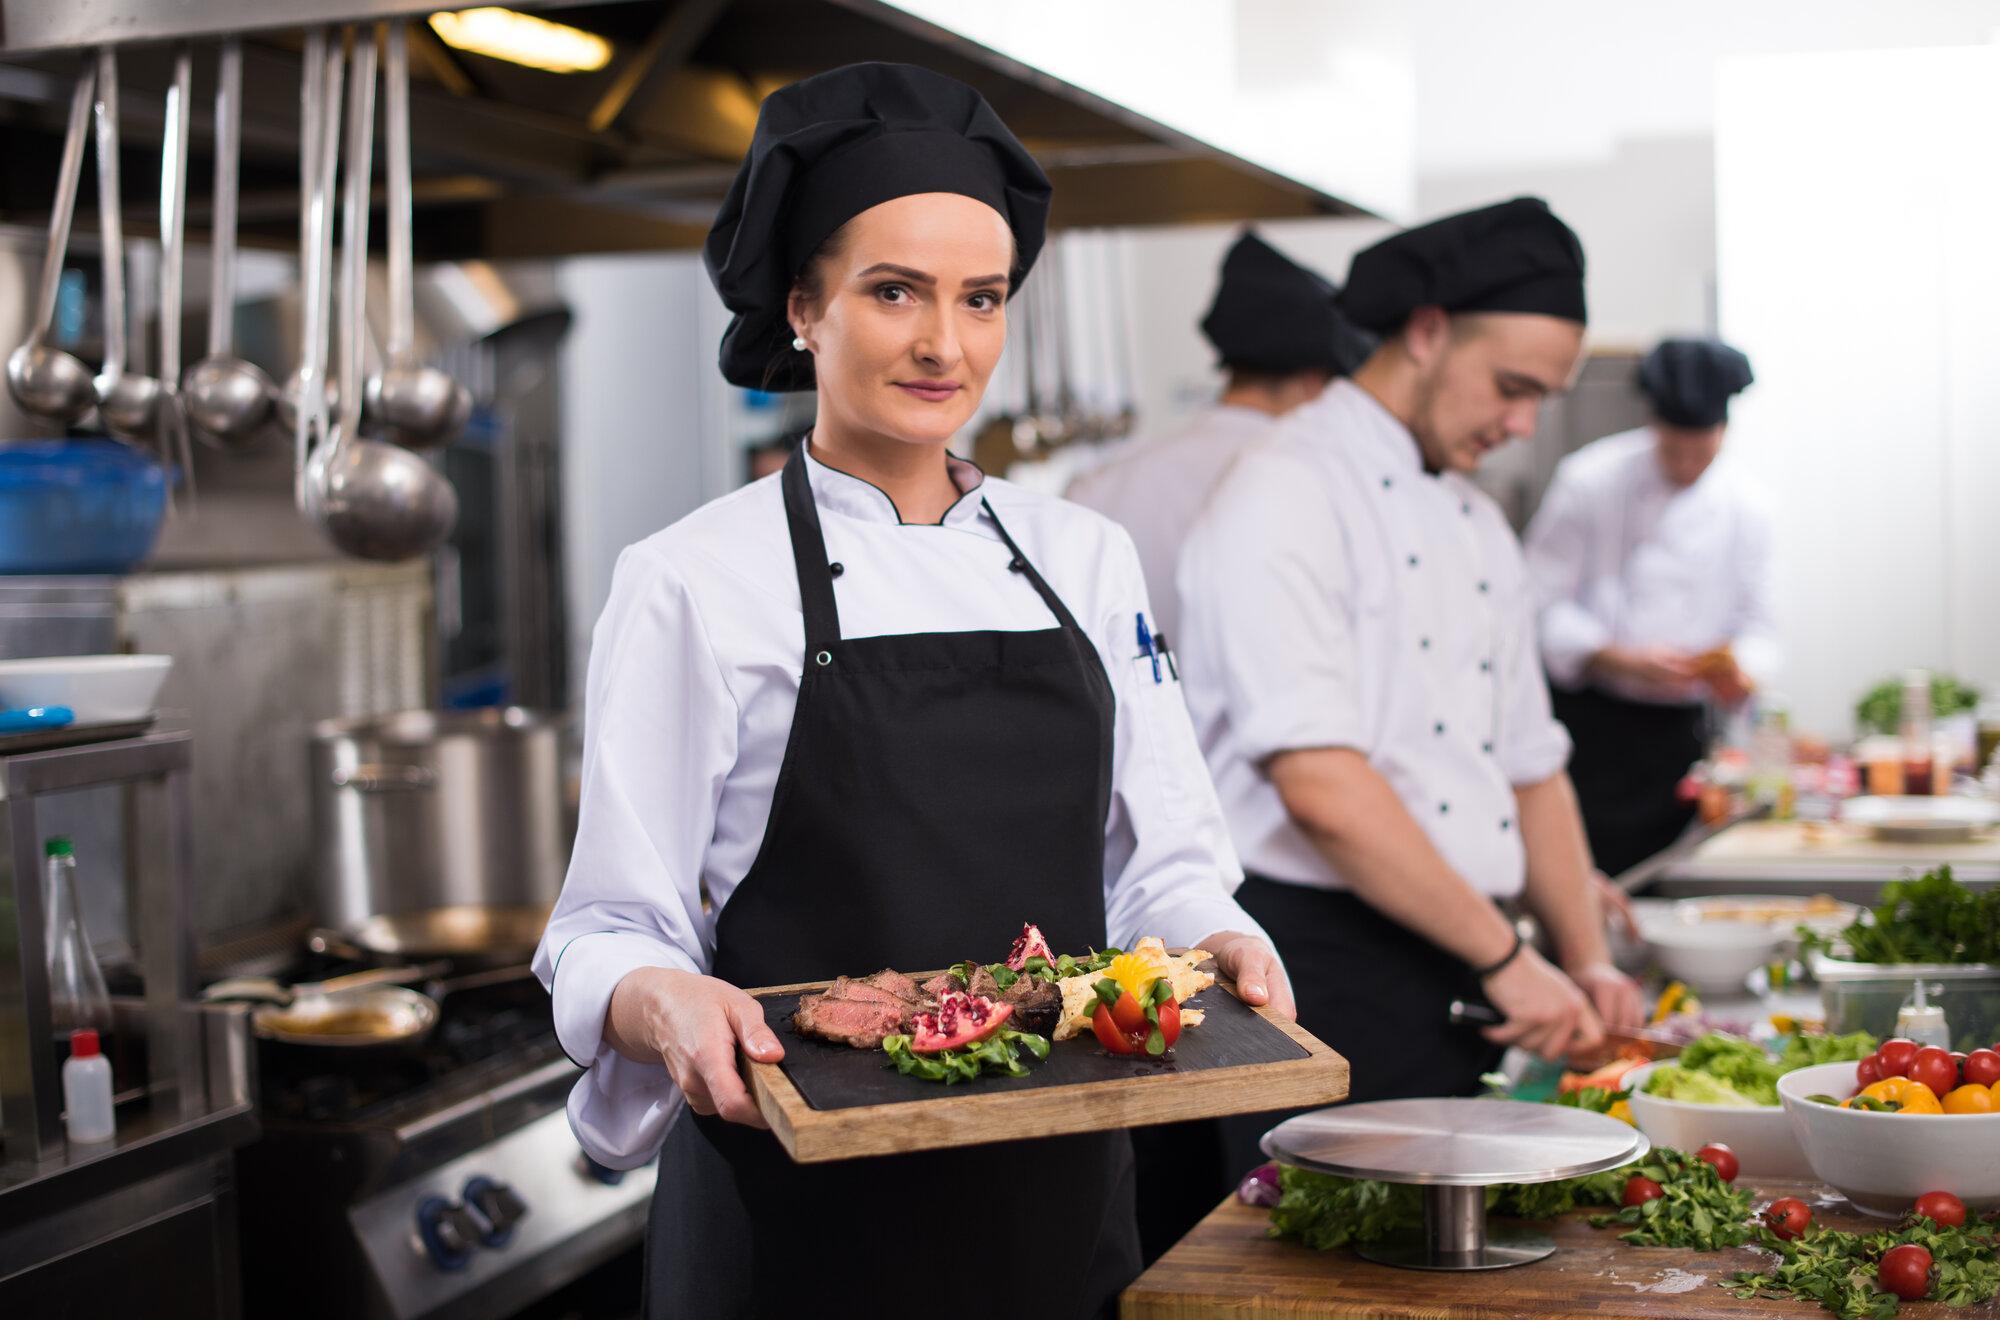 female chef holding beef steak plate PTHM3QD - Startseite